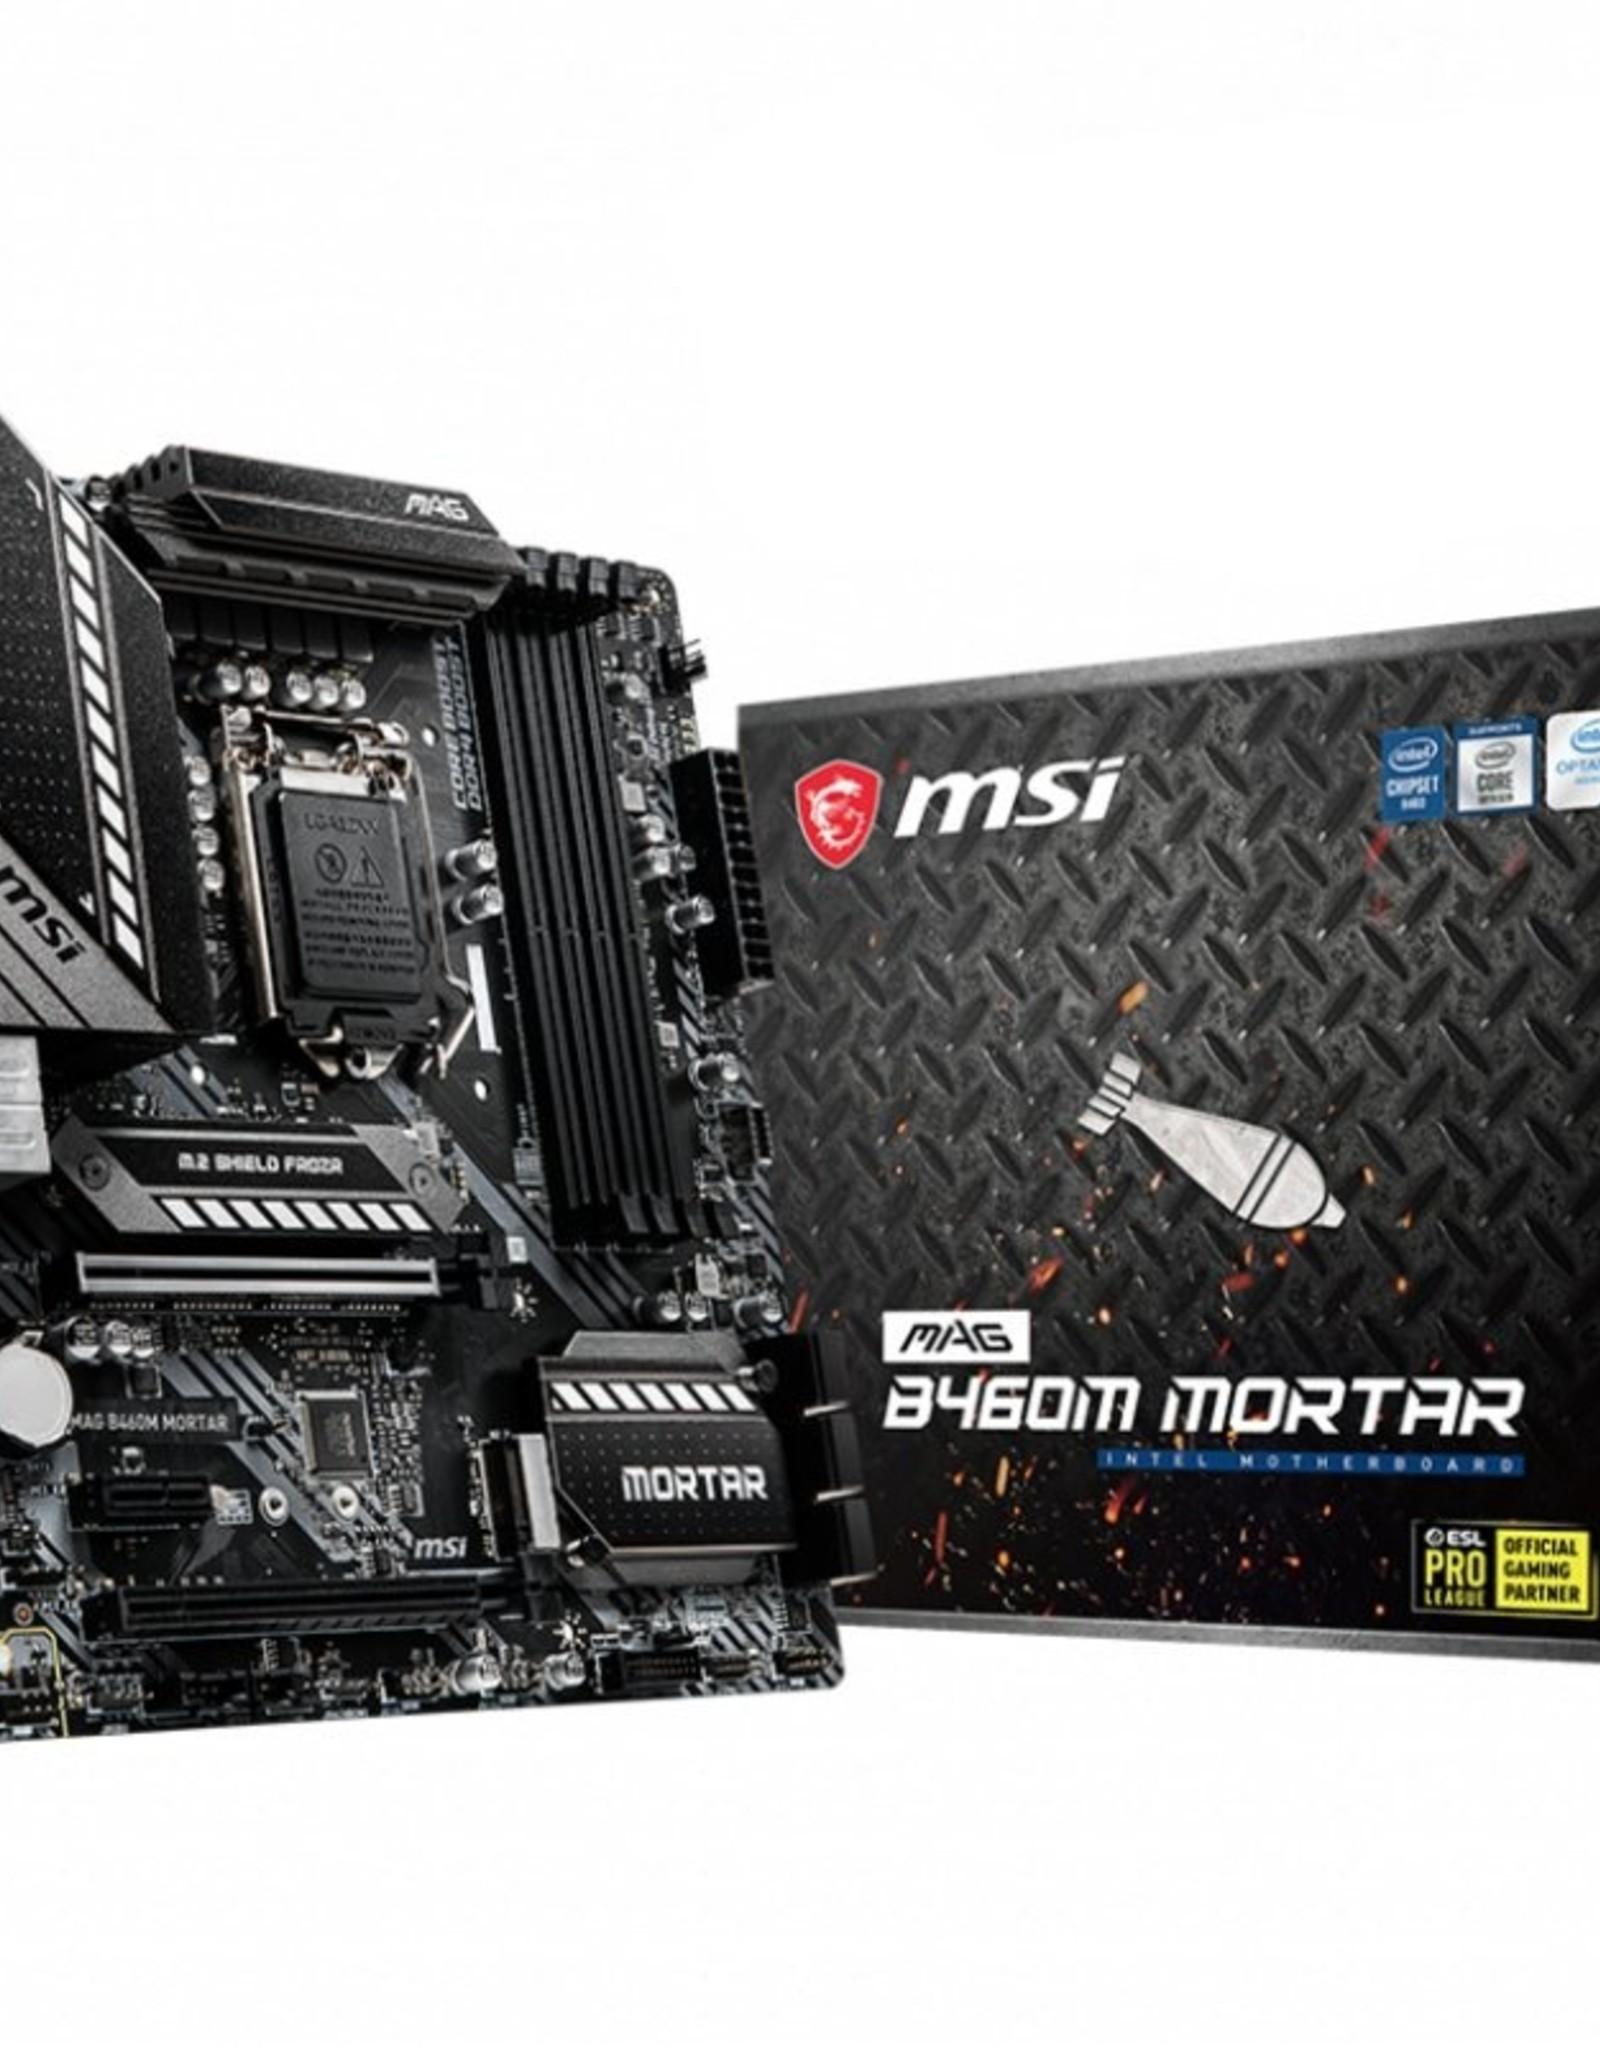 MB  MAG B460M MORTAR LGA 1200 micro ATX Intel B460